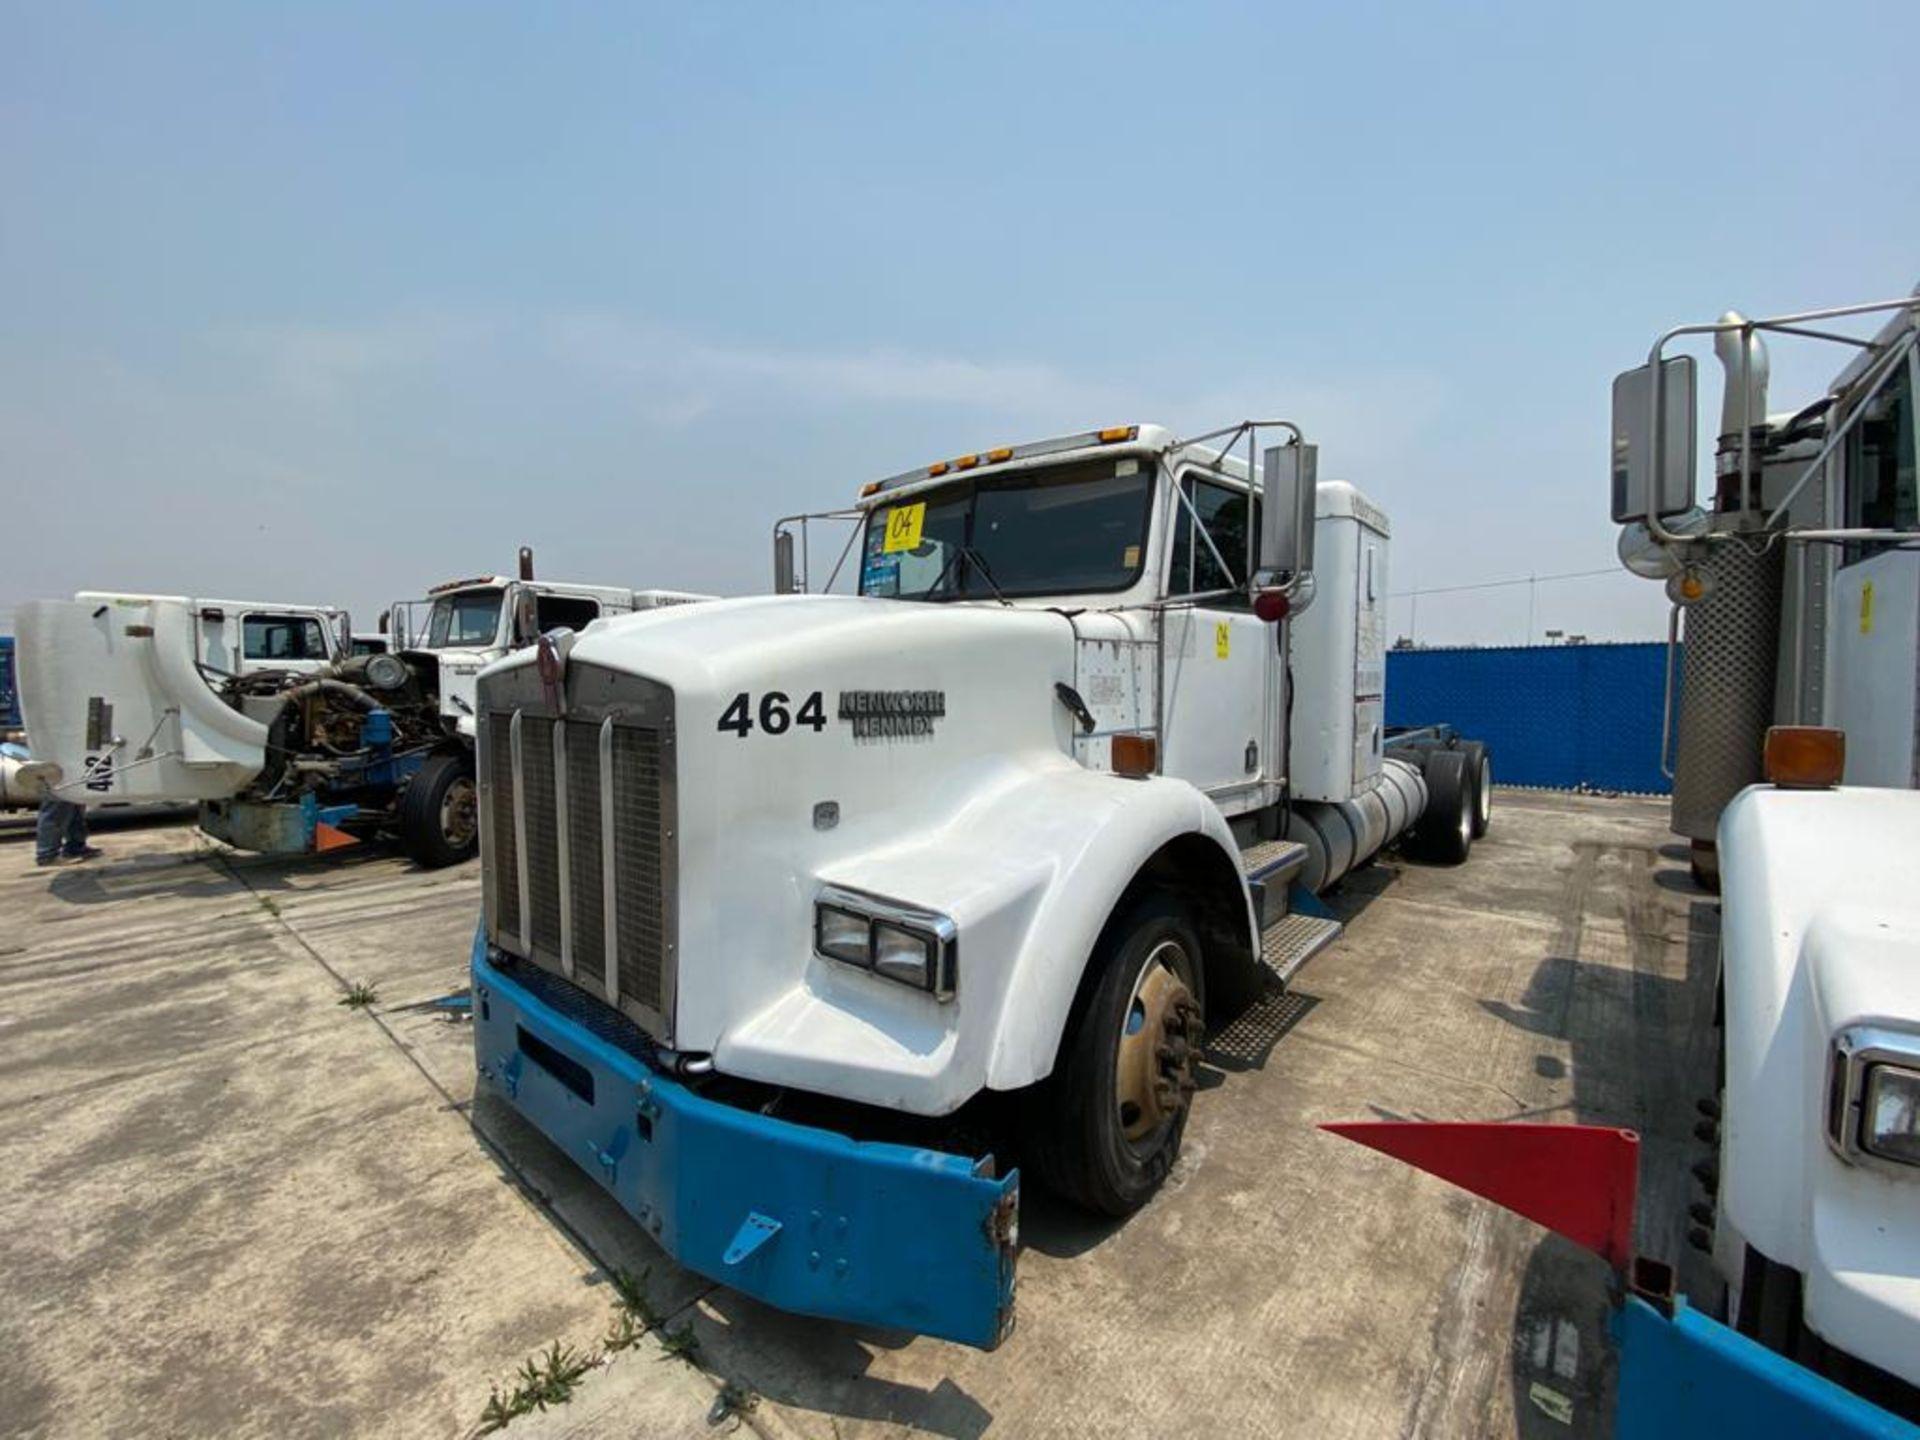 1999 Kenworth Sleeper truck tractor, standard transmission of 18 speeds - Image 9 of 70